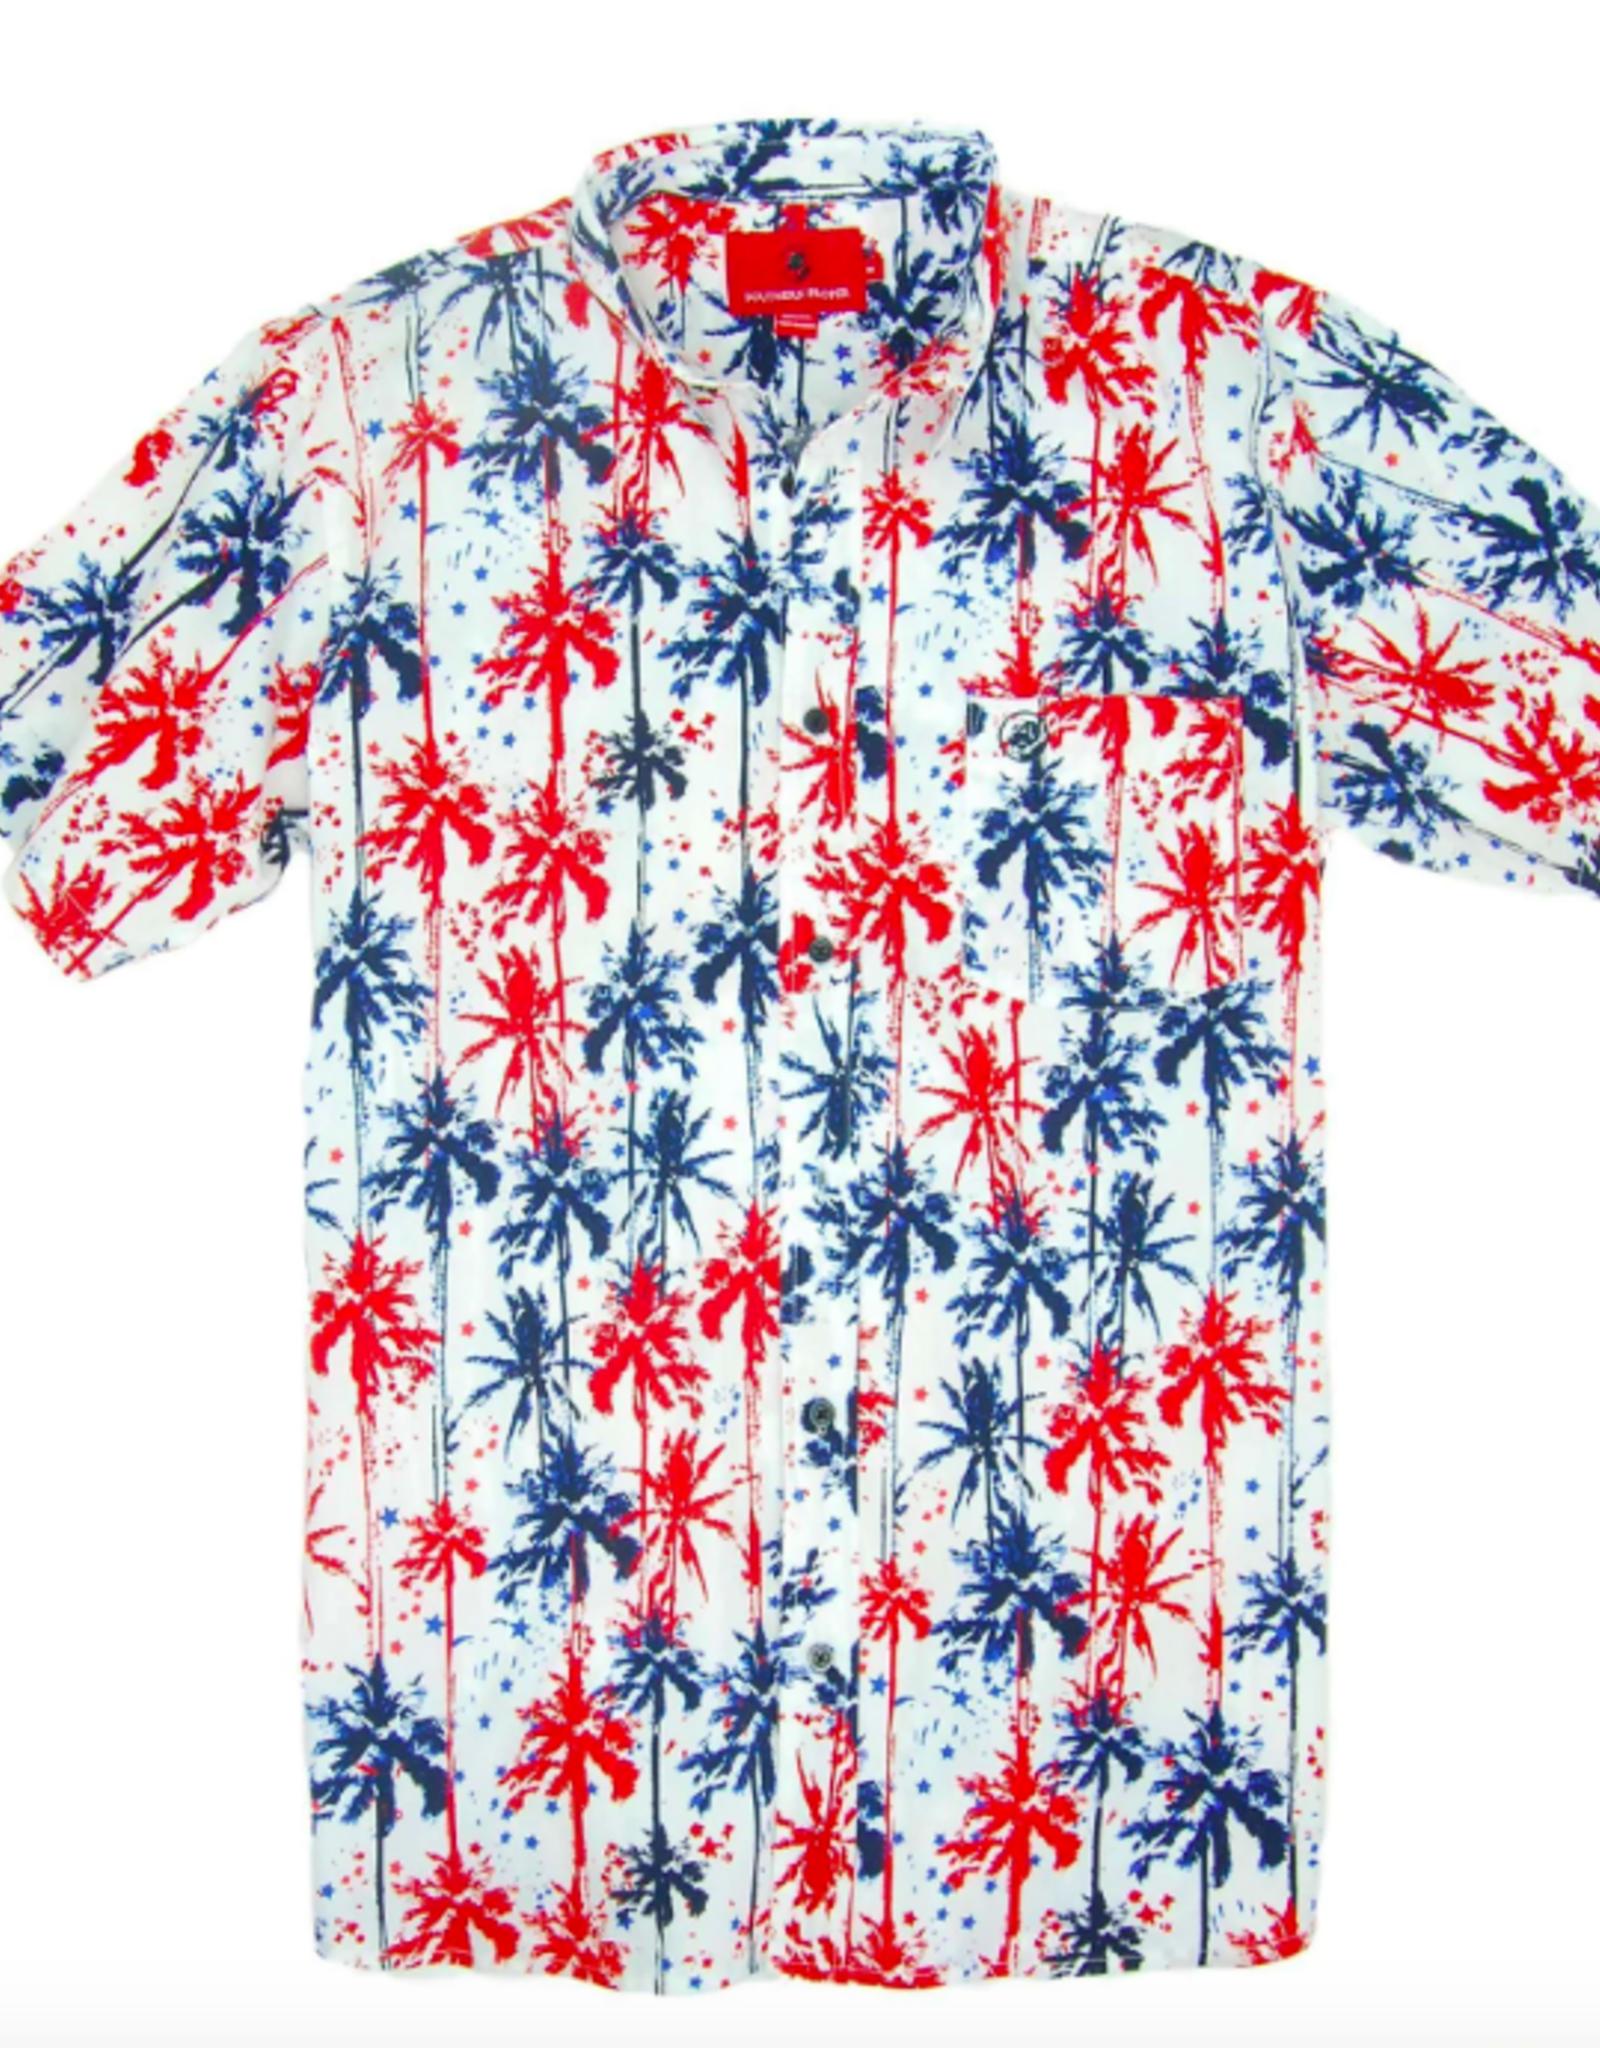 Southern Proper Social Shirt